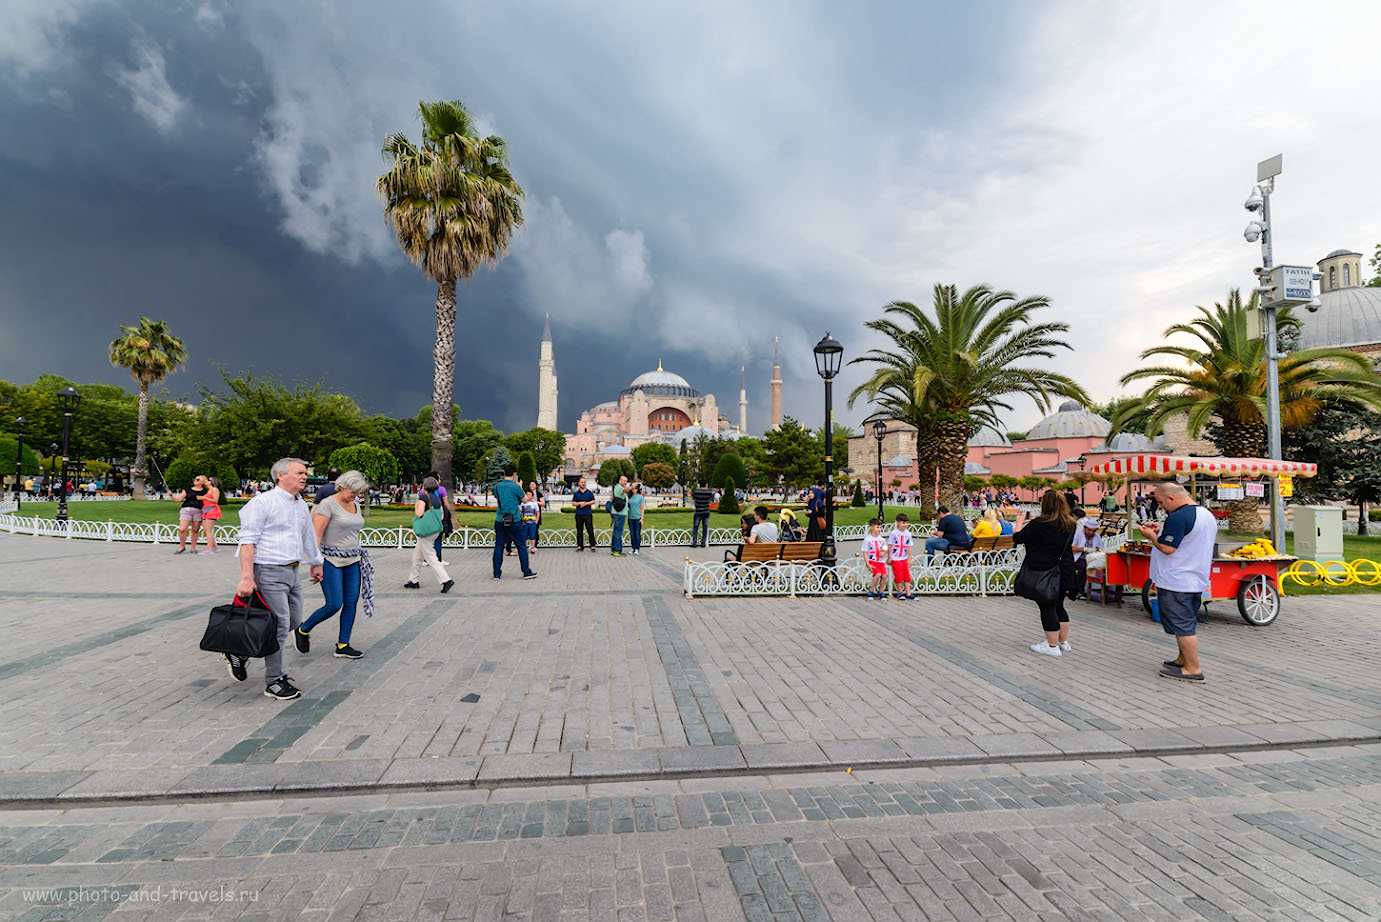 Фотография 12. Туристы на площади Султанахмет в Стамбуле. Цистерна Базилика - за деревьями, слева от Айя-Софии. 1/320, -0.67, 320, 14.